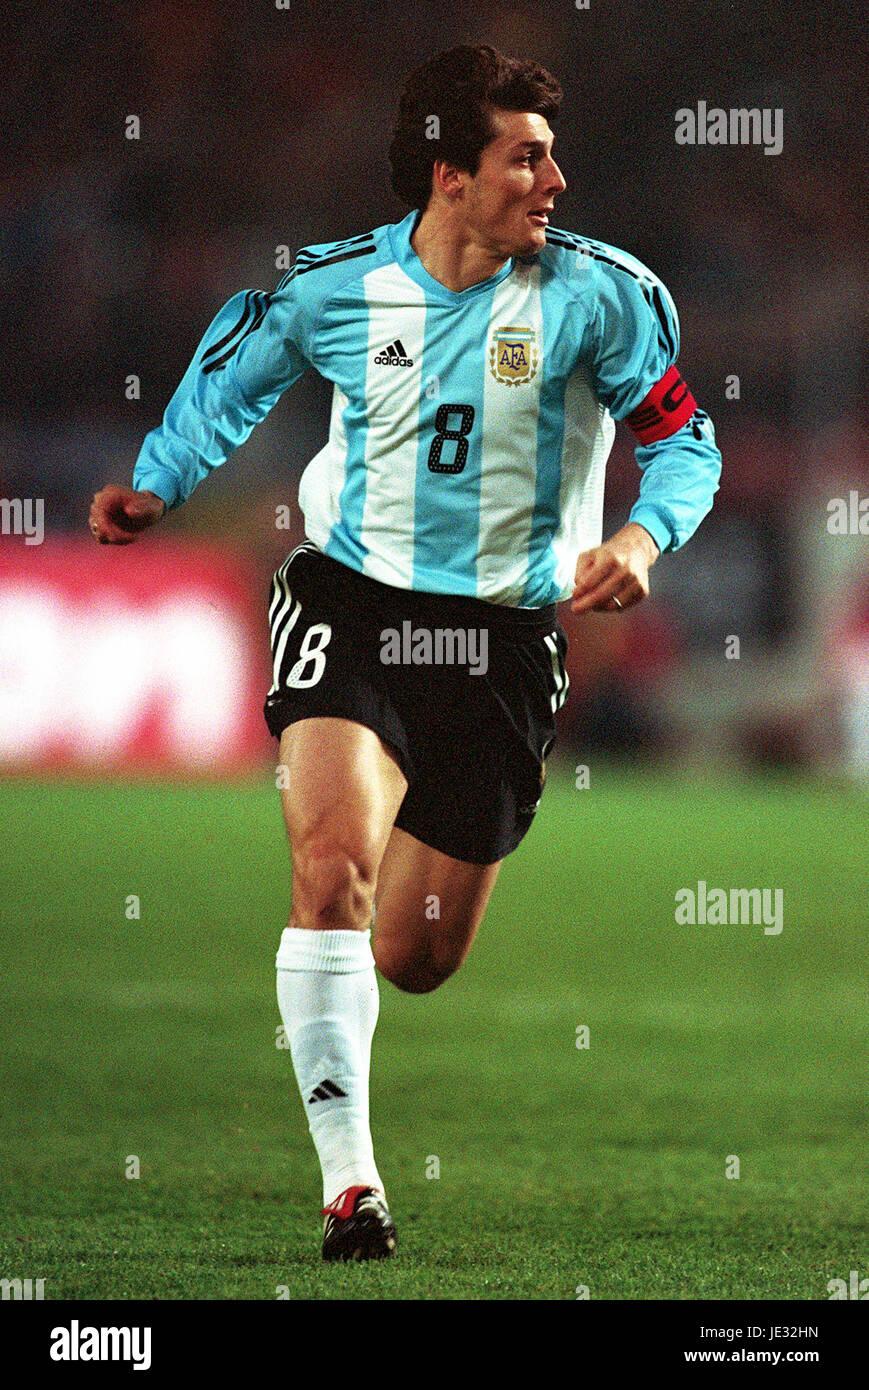 JAVIER ZANETTI ARGENTINA & INTER MILAN FC STUTTGART GERMANY 17